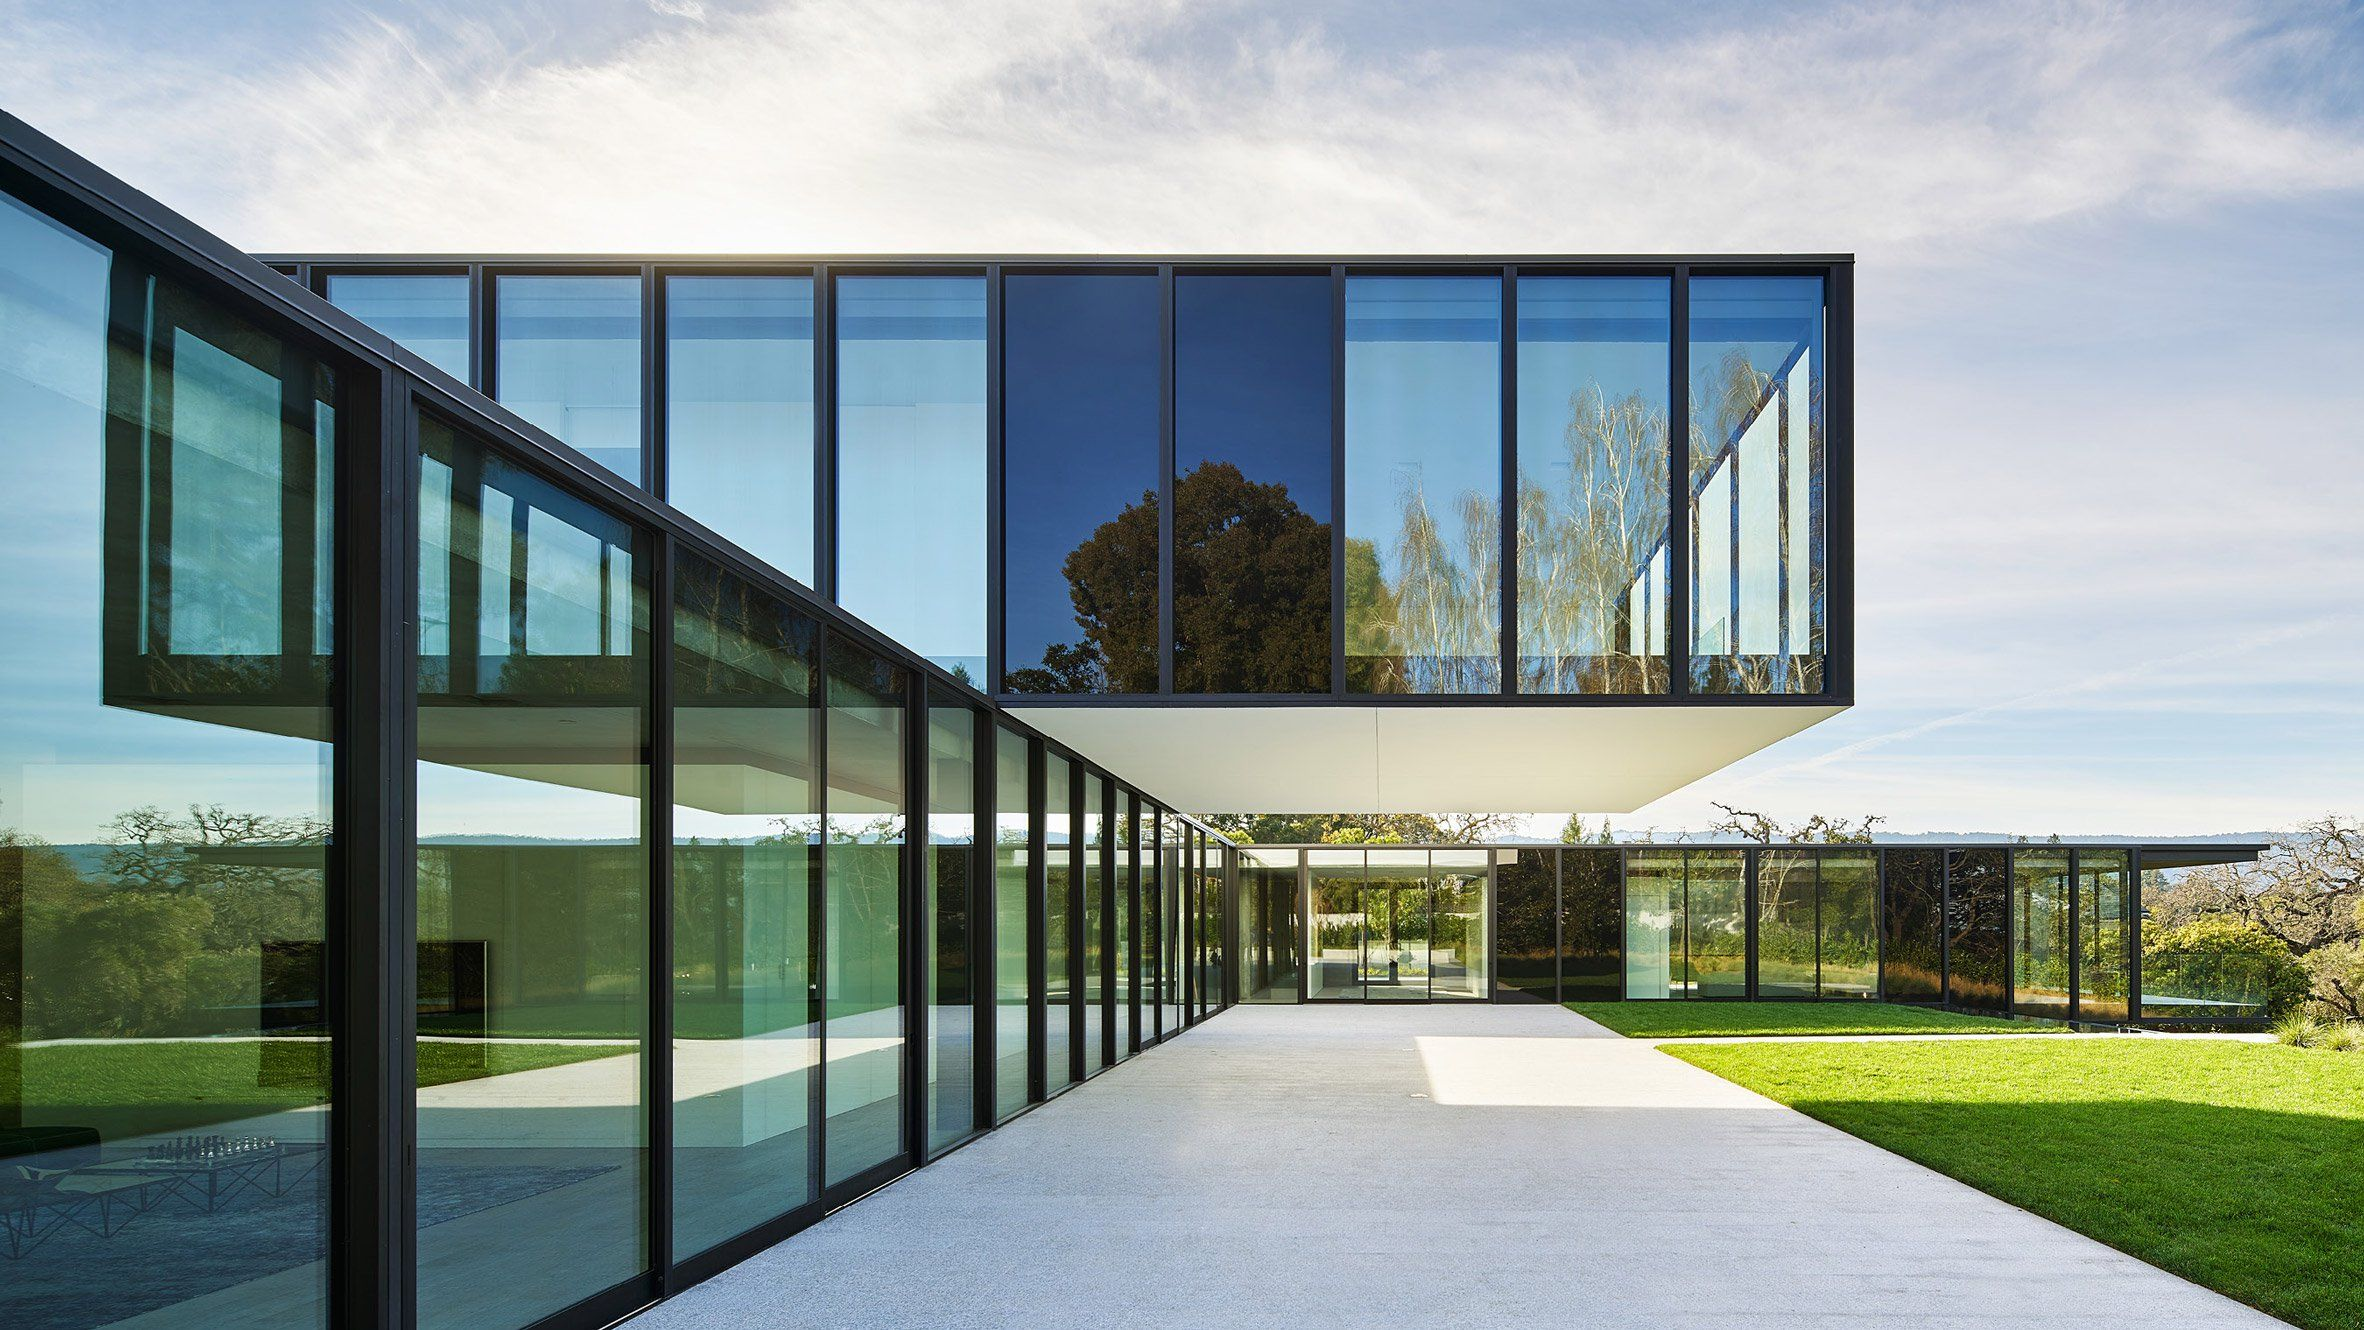 Oz House Atherton California by Stanley Saitowitz of Natoma Architects & Oz House Atherton California by Stanley Saitowitz of Natoma ...